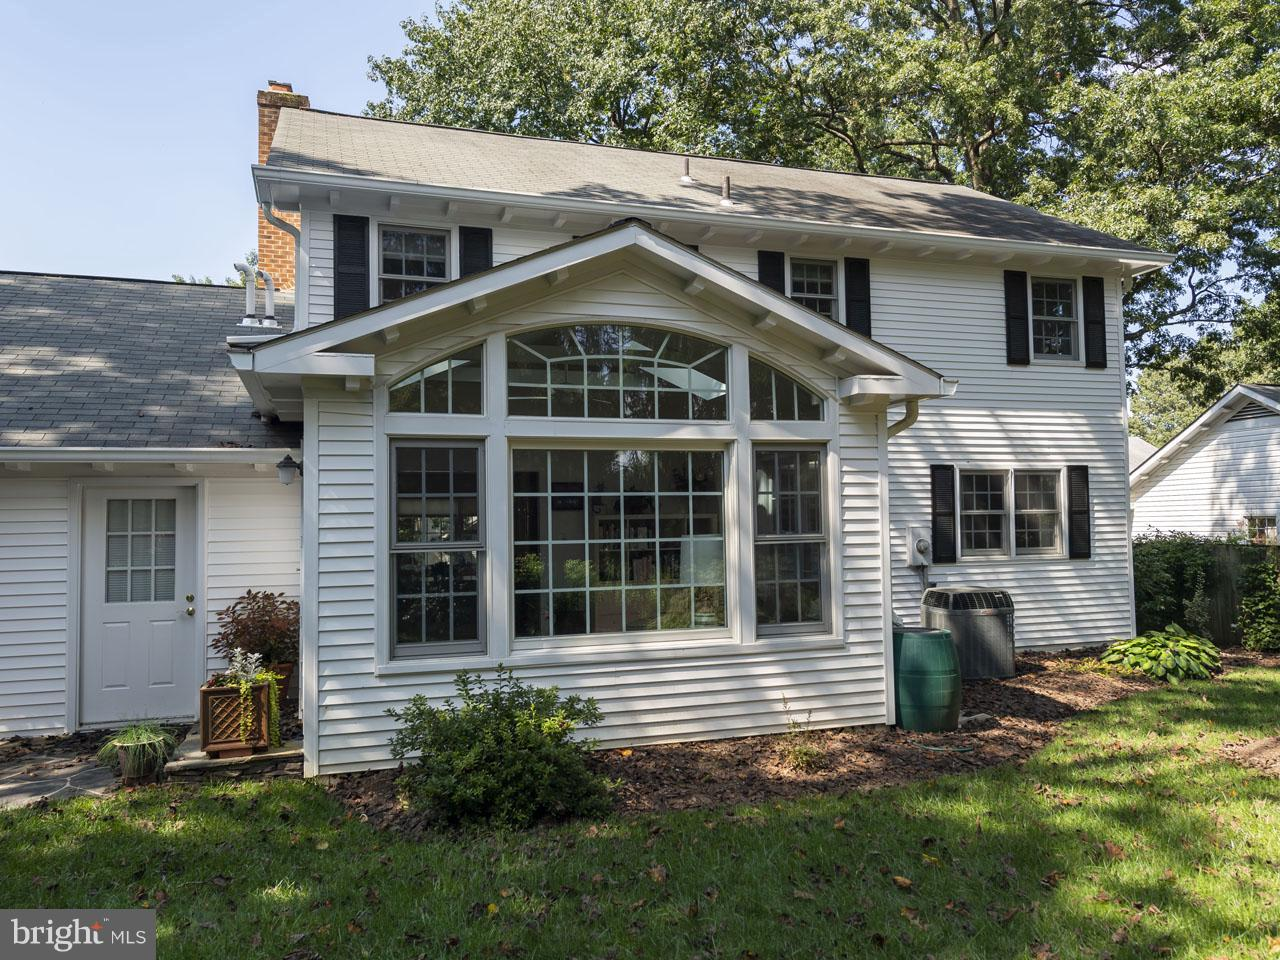 1006211278-300688039291-2021-07-22-07-39-39        Burke Delaware Real Estate For Sale   MLS# 1006211278  - Best of Northern Virginia